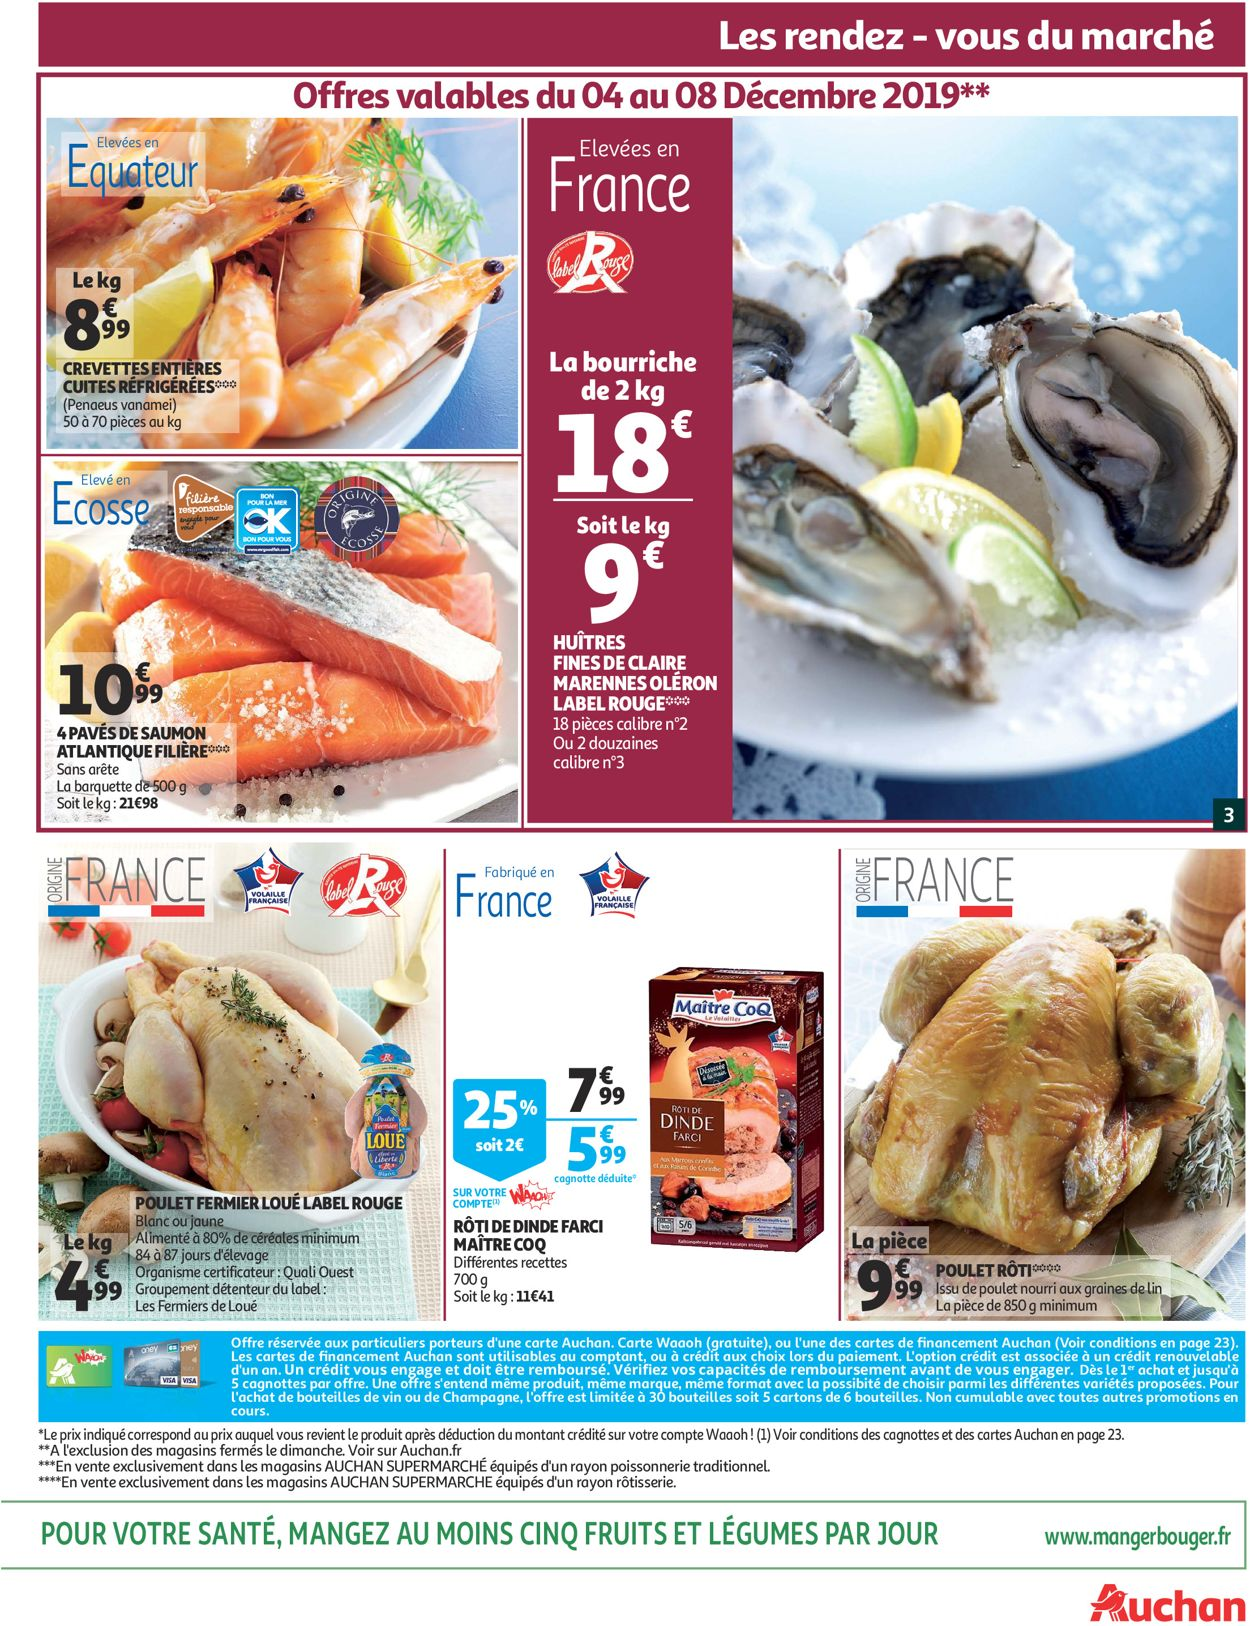 Auchan Catalogue - 04.12-10.12.2019 (Page 3)